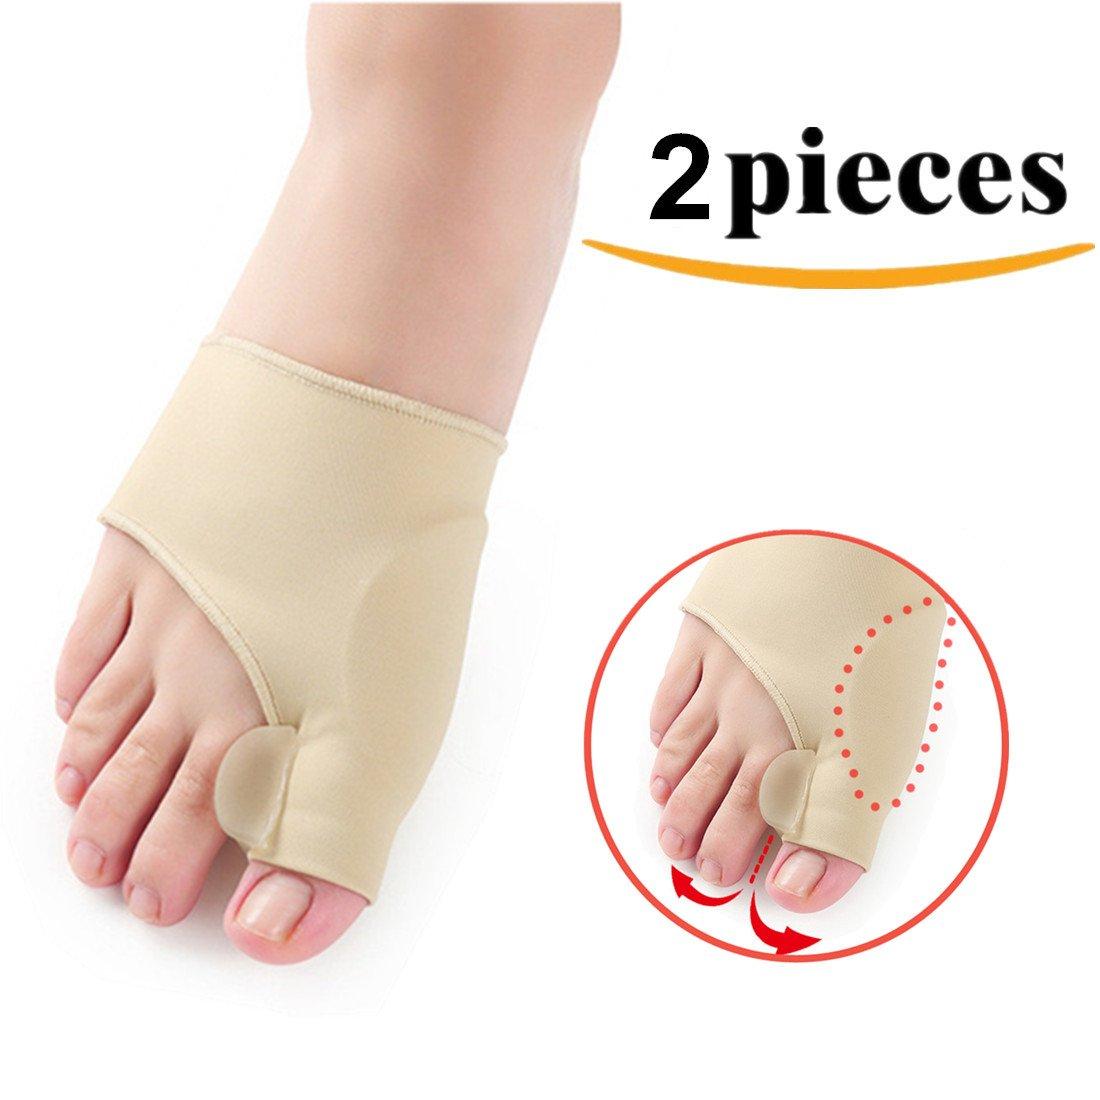 Kalevel Toe Separators Pedicure Bunion Corrector Night Time Bunion Regulator Bunion Splint for Left Foot Right Foot Pack of 2pcs